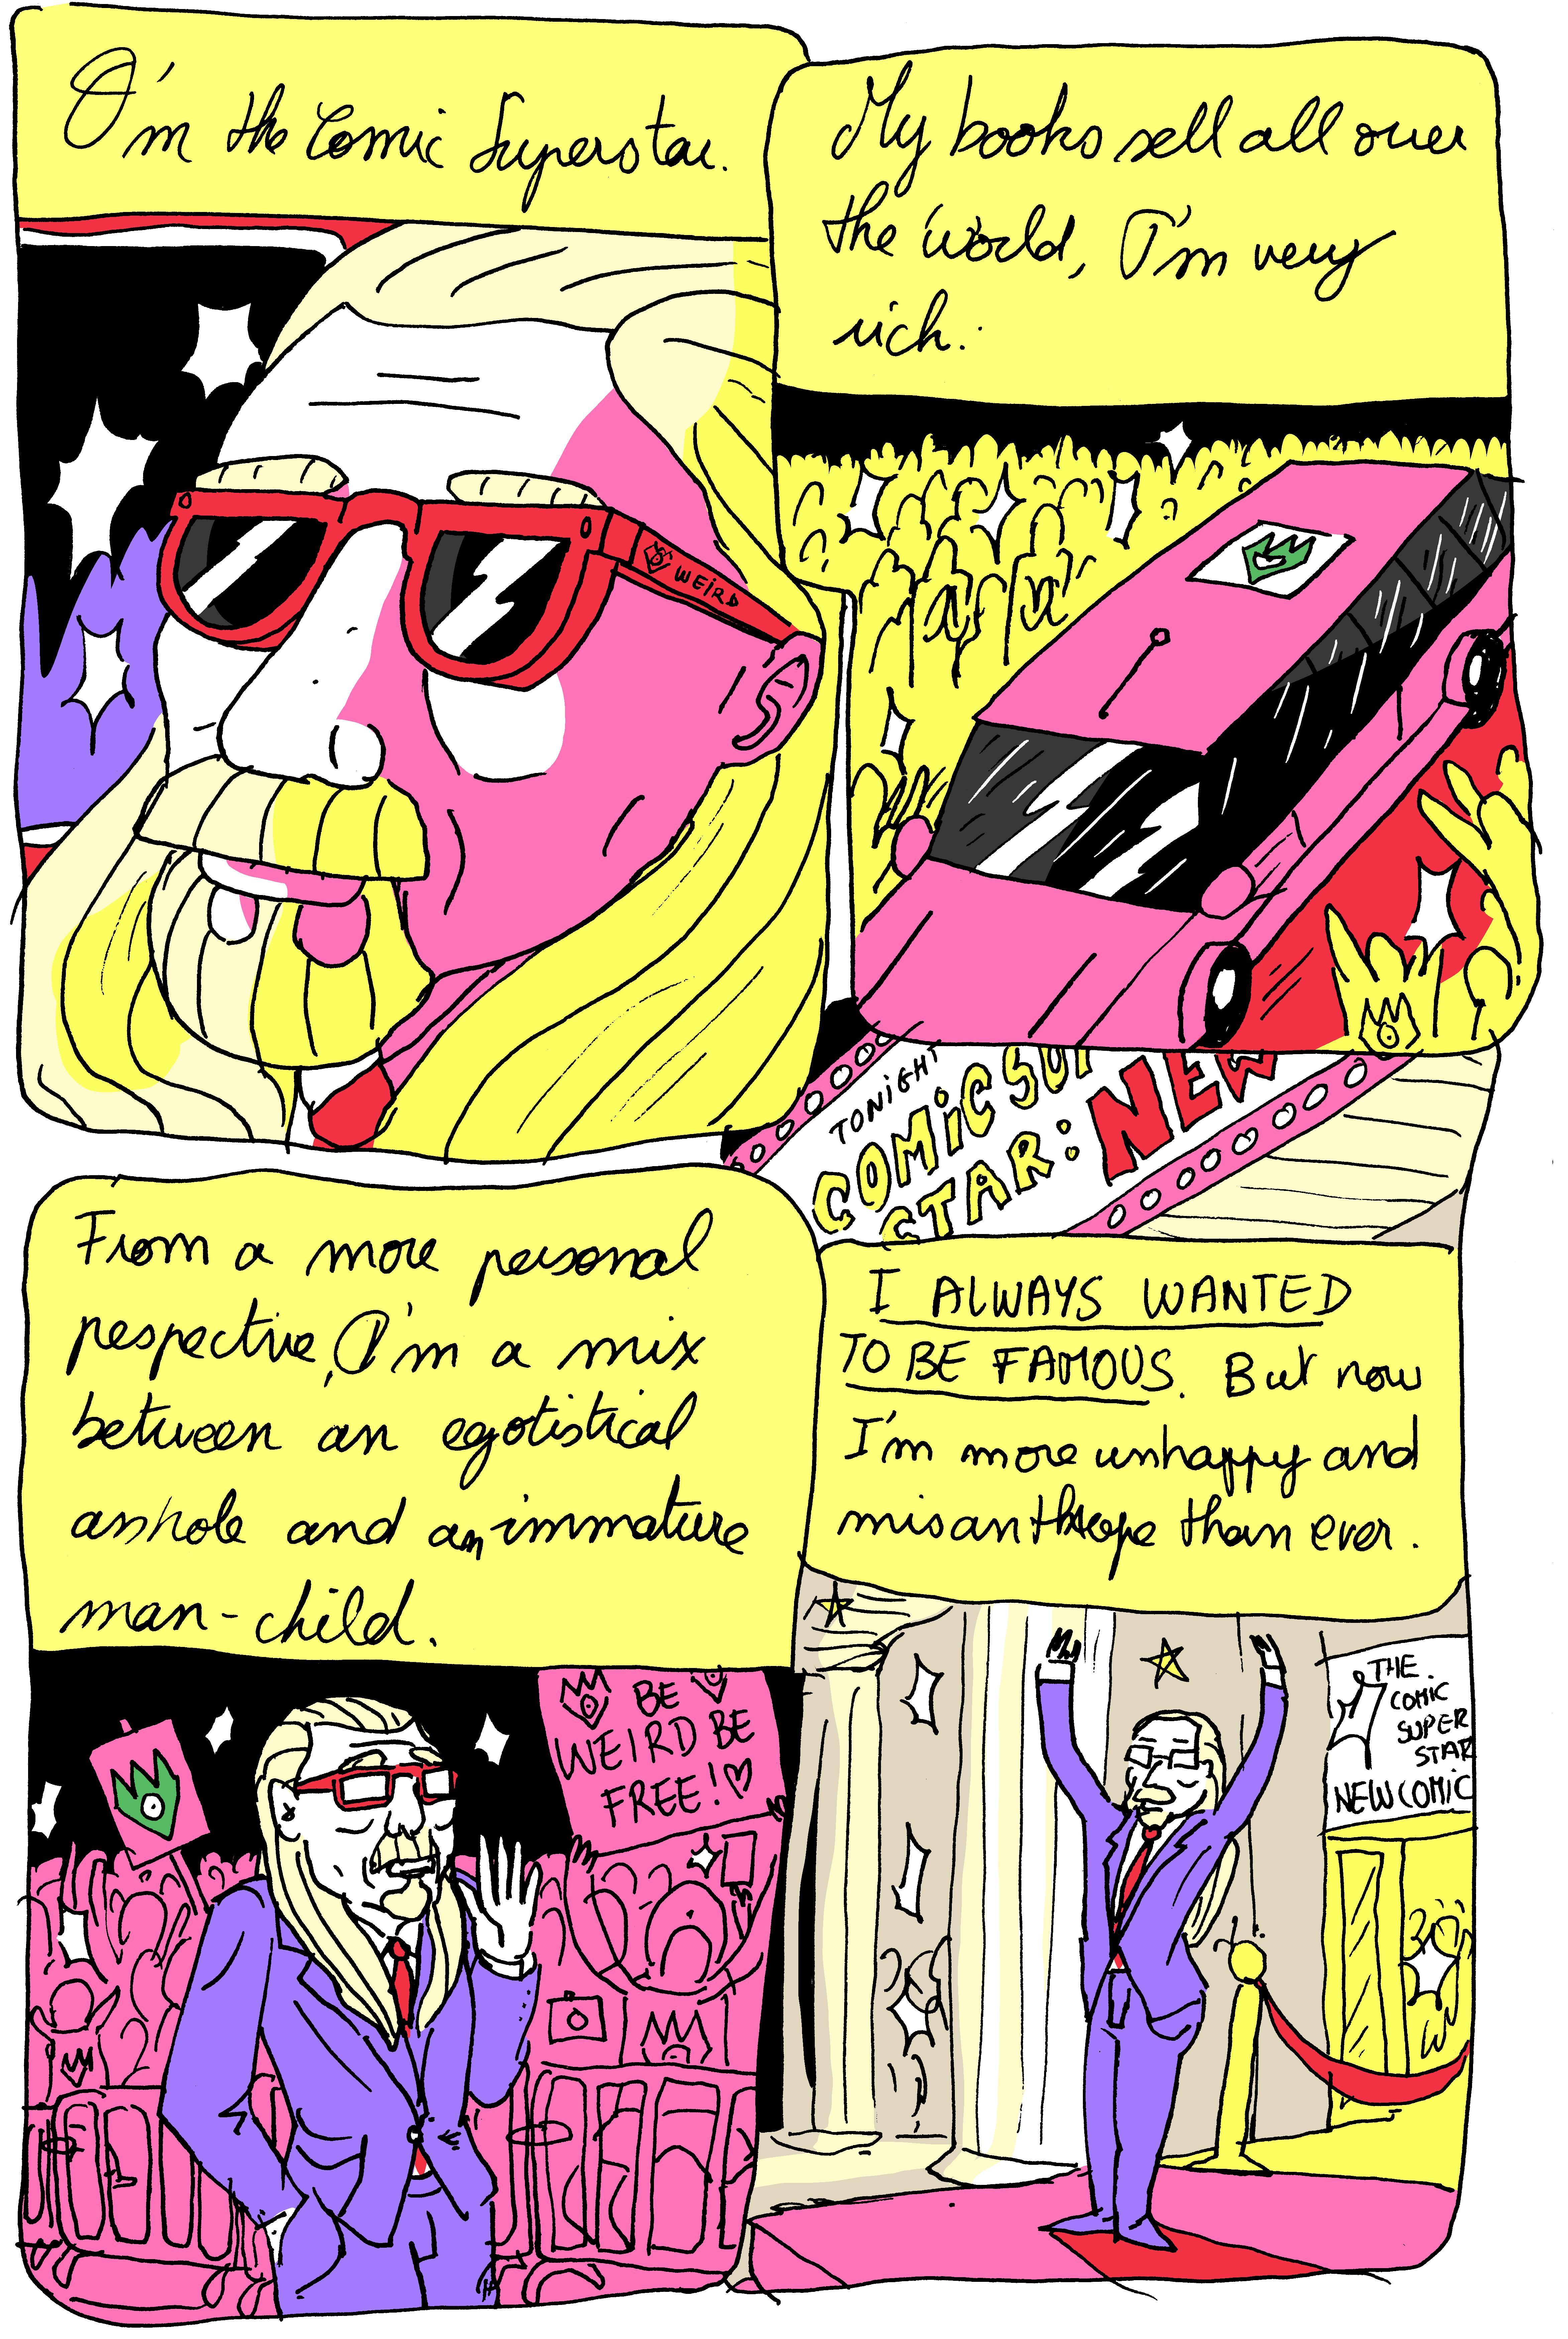 The Comic Super Star